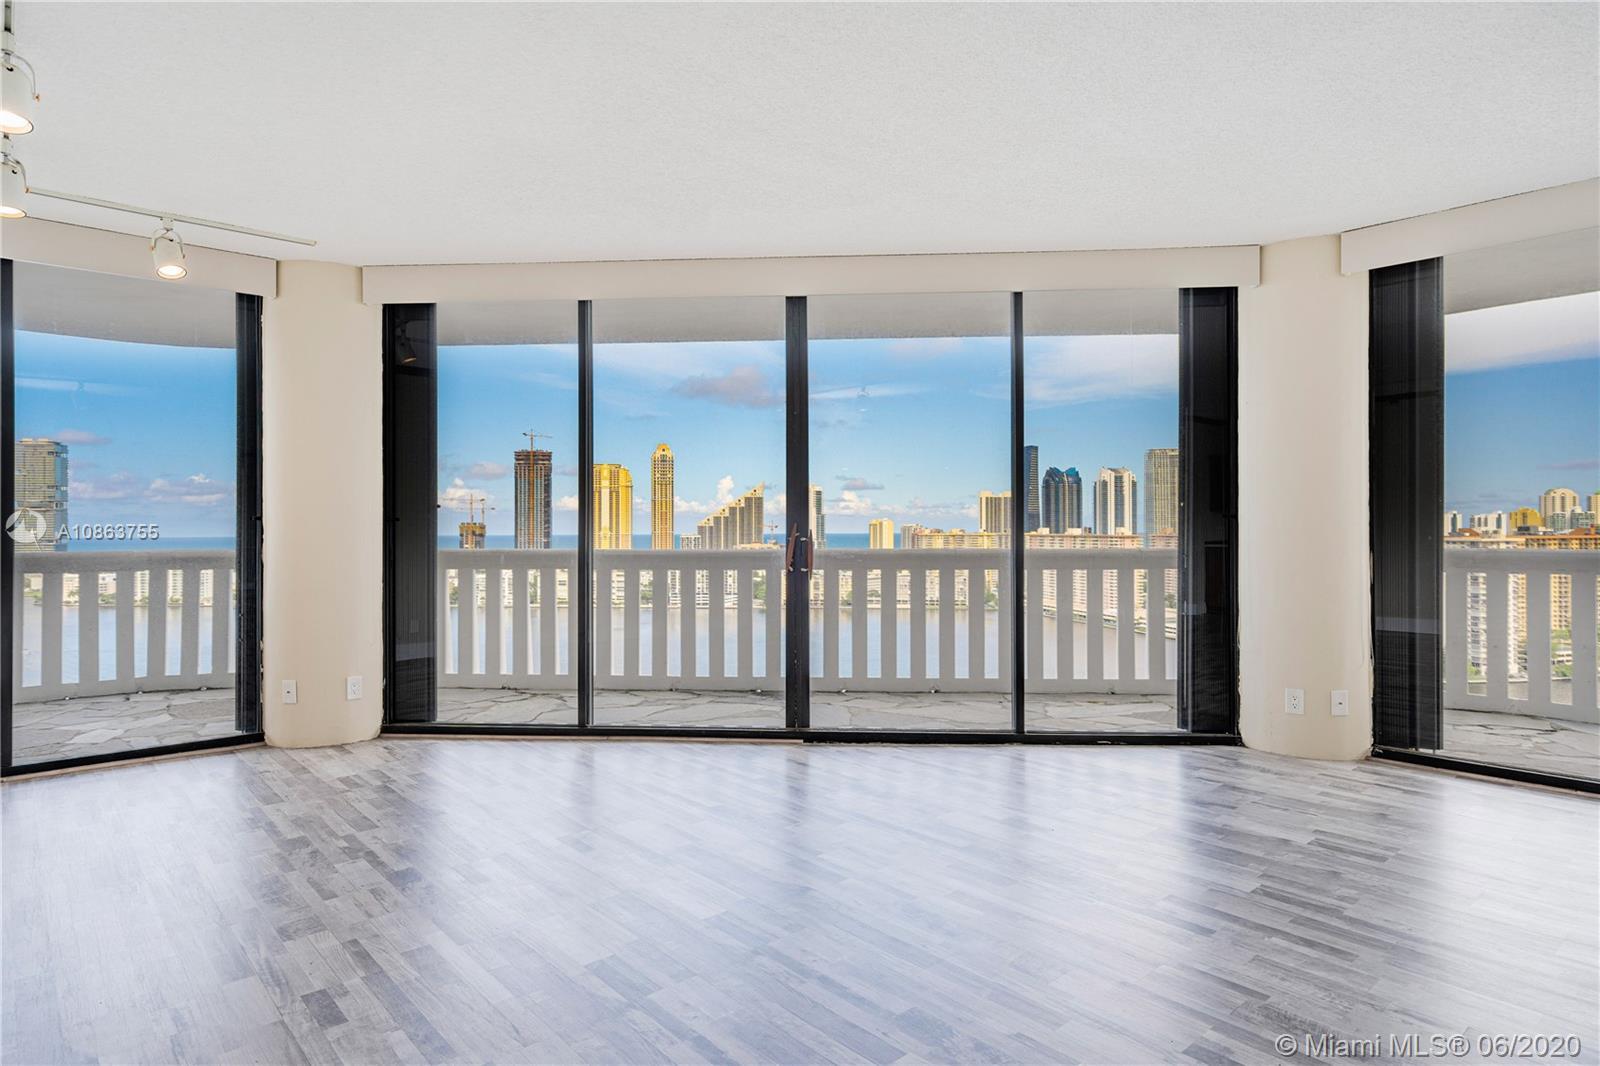 3000 Island Blvd #2406, Aventura, FL 33160 - Aventura, FL real estate listing